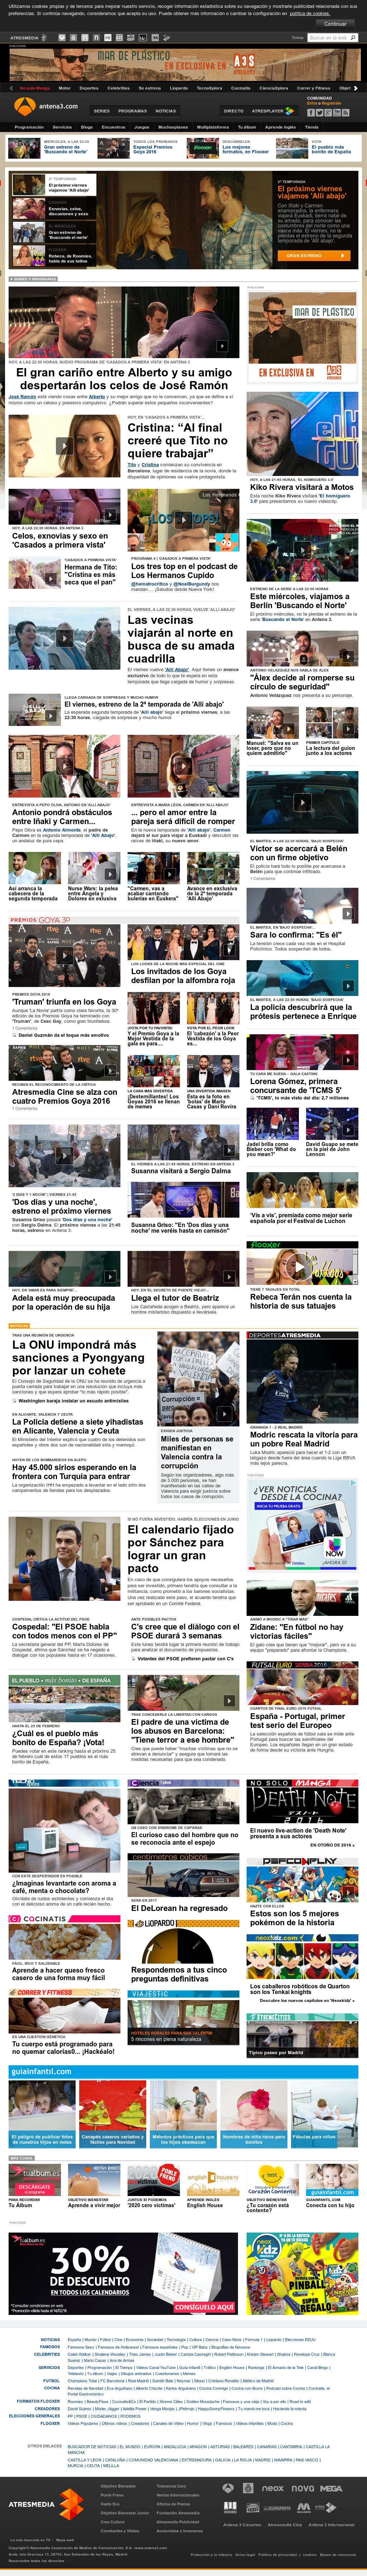 Antena 3 Competitors, Revenue and Employees - Owler Company Profile